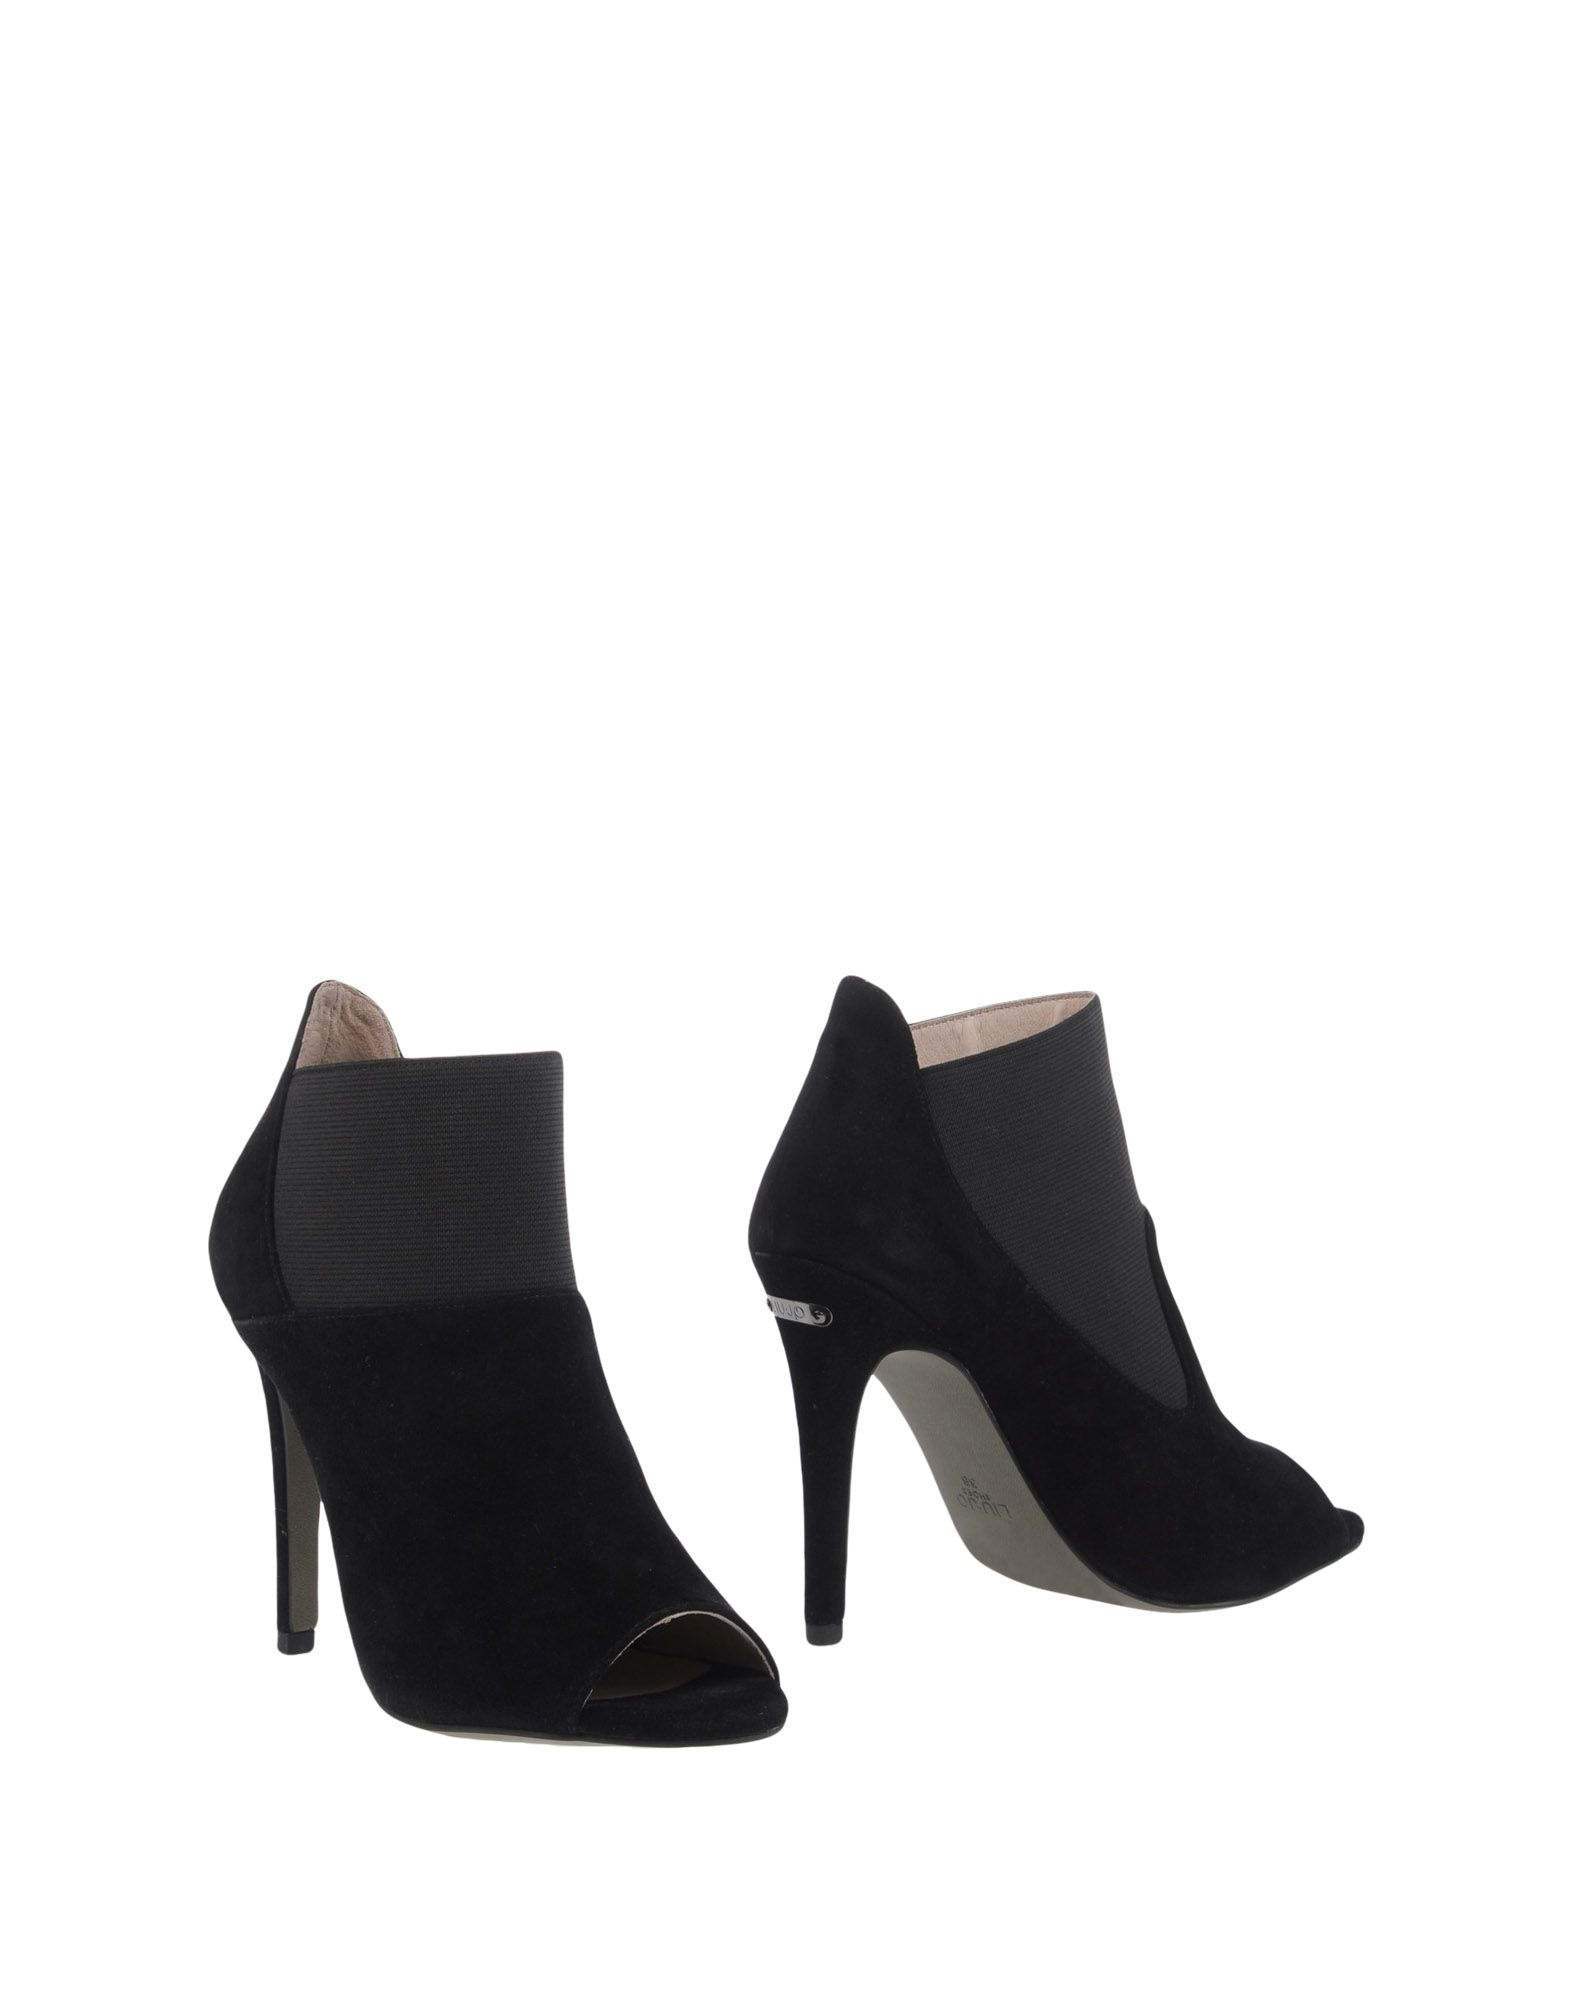 Liu •Jo Shoes Stiefelette Damen  11206791BB Gute Qualität beliebte Schuhe